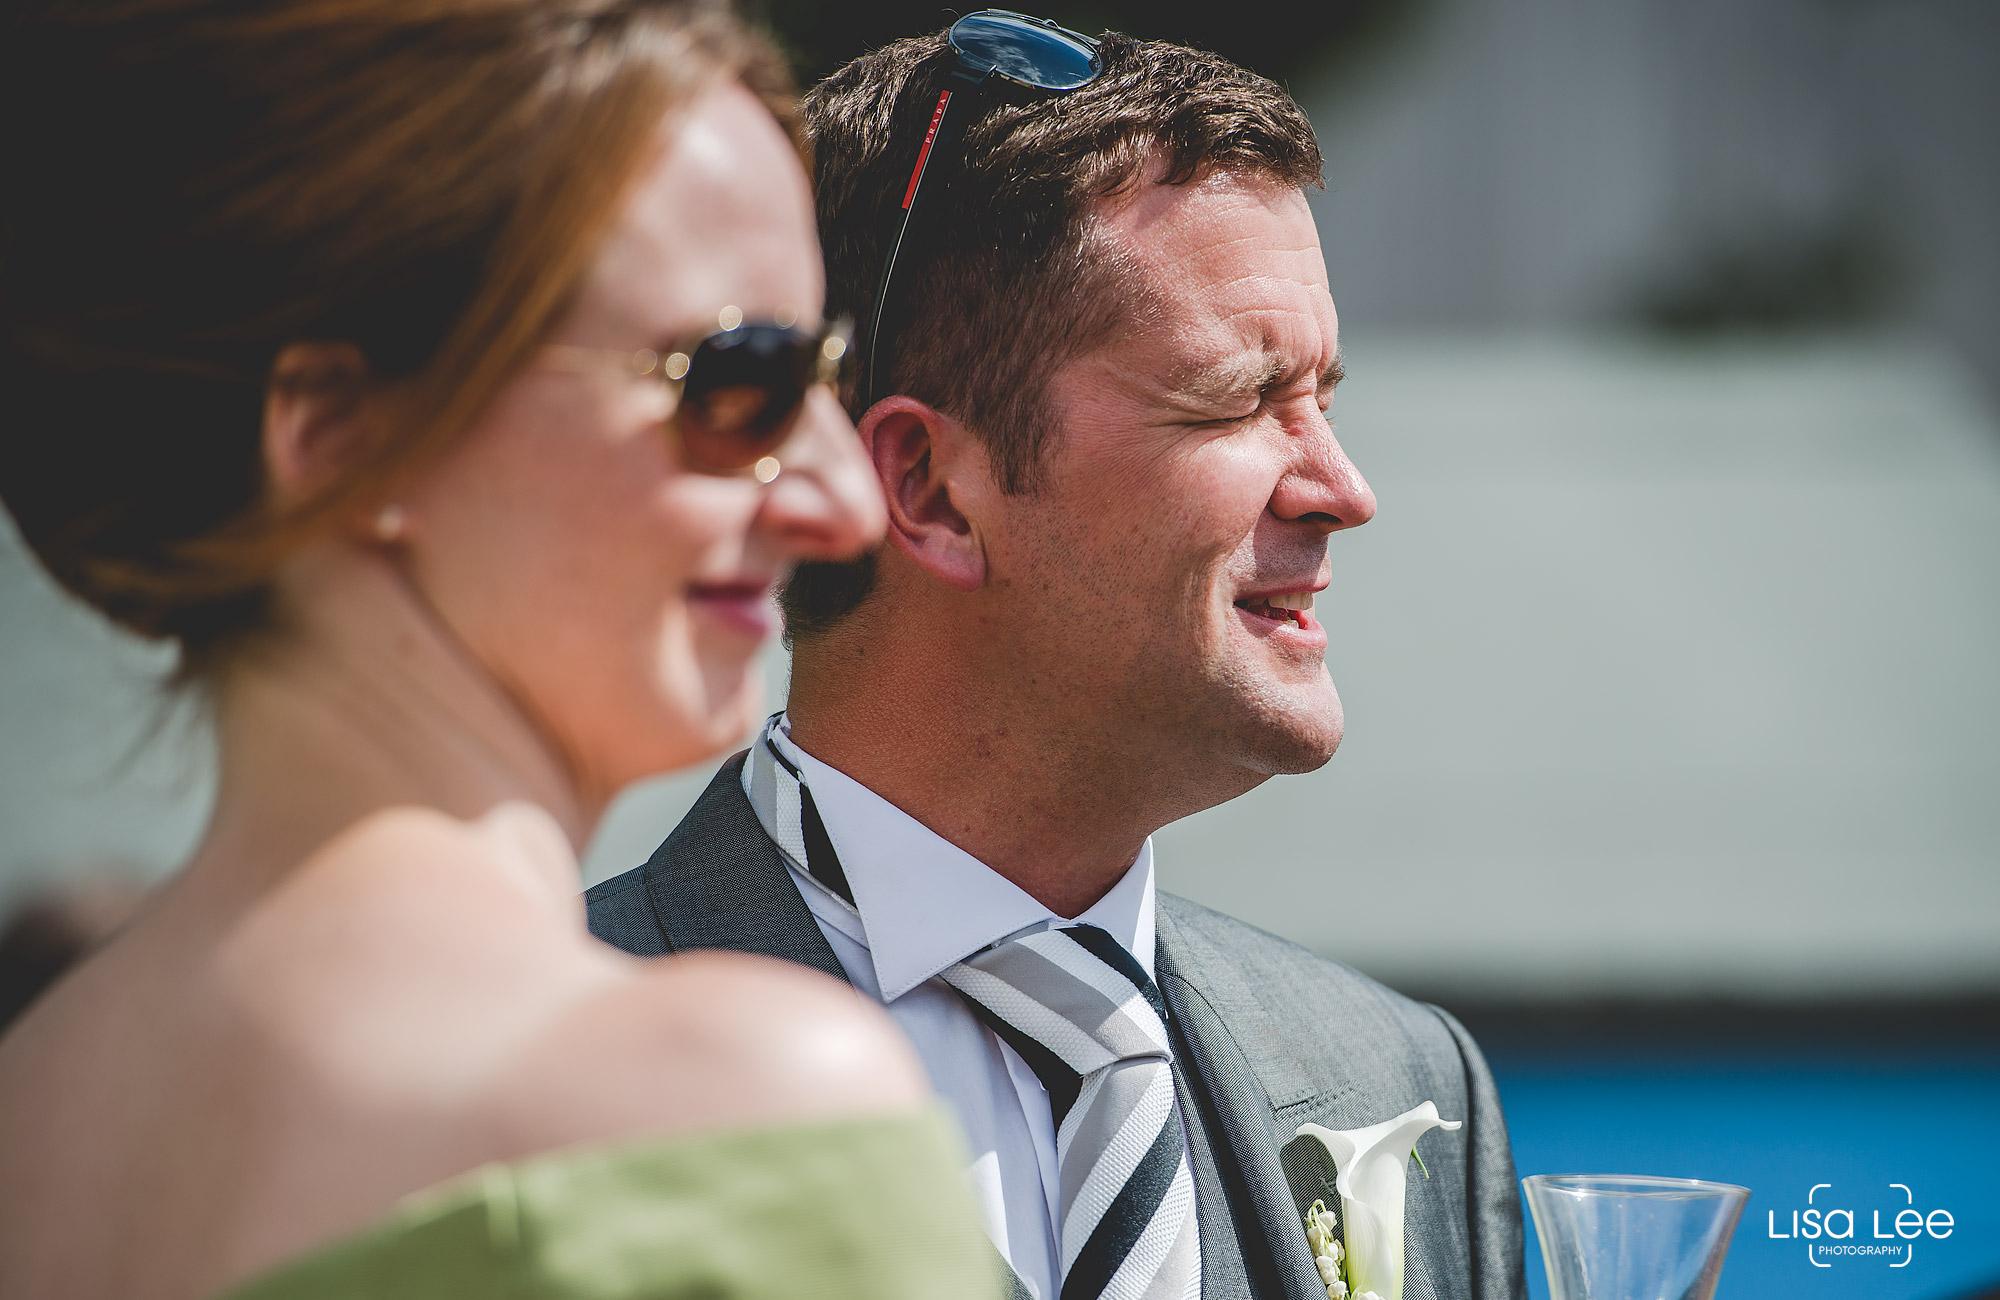 lisa-lee-wedding-photography-christchurch-dorset-groom.jpg